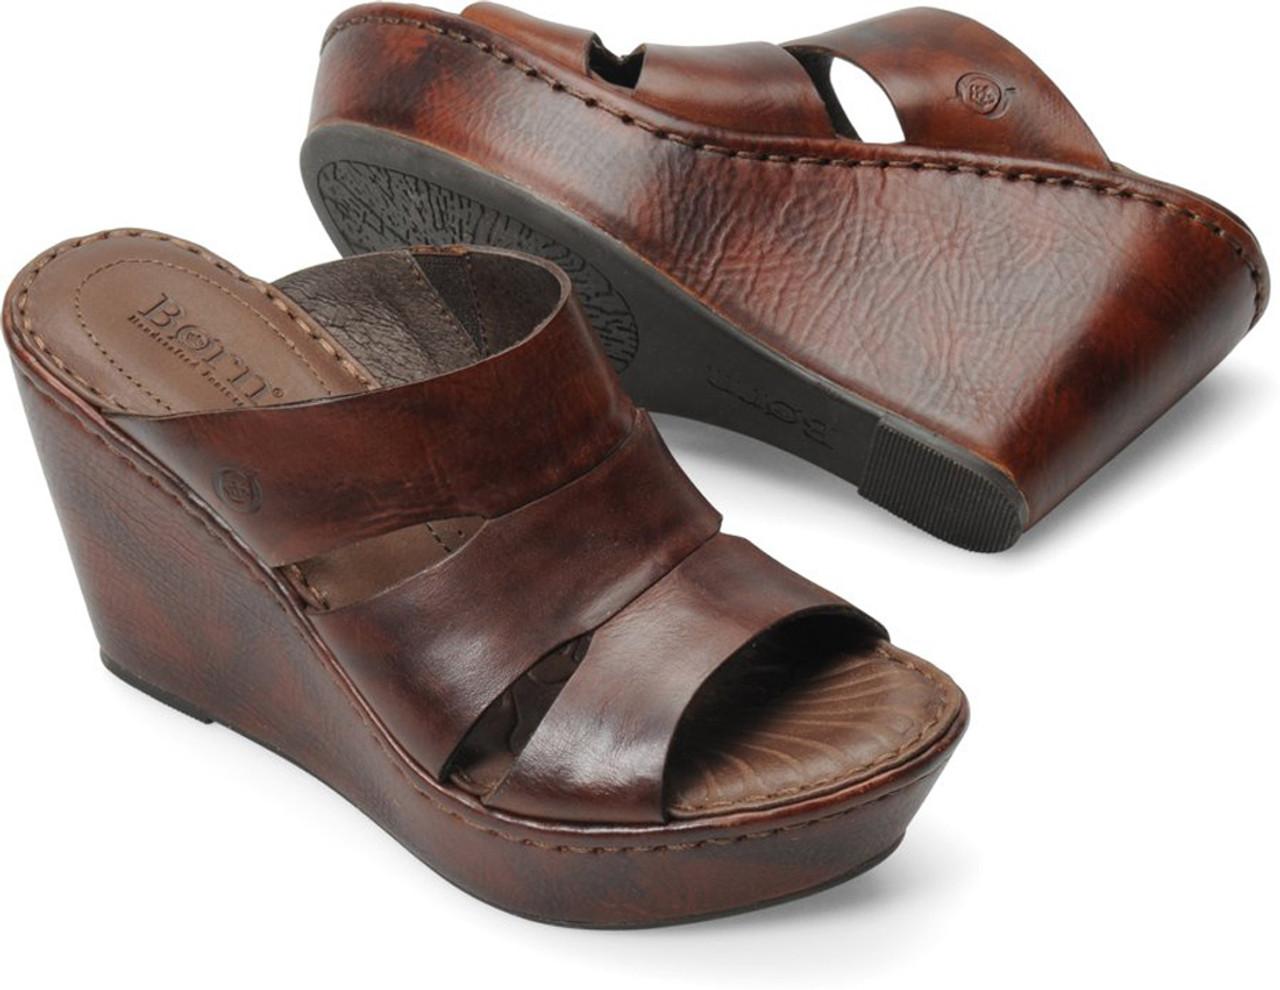 b7dd872312ad Born Women s Amalia Wedge Slide Sandal Whiskey Leather - Shop now    Shoolu.com